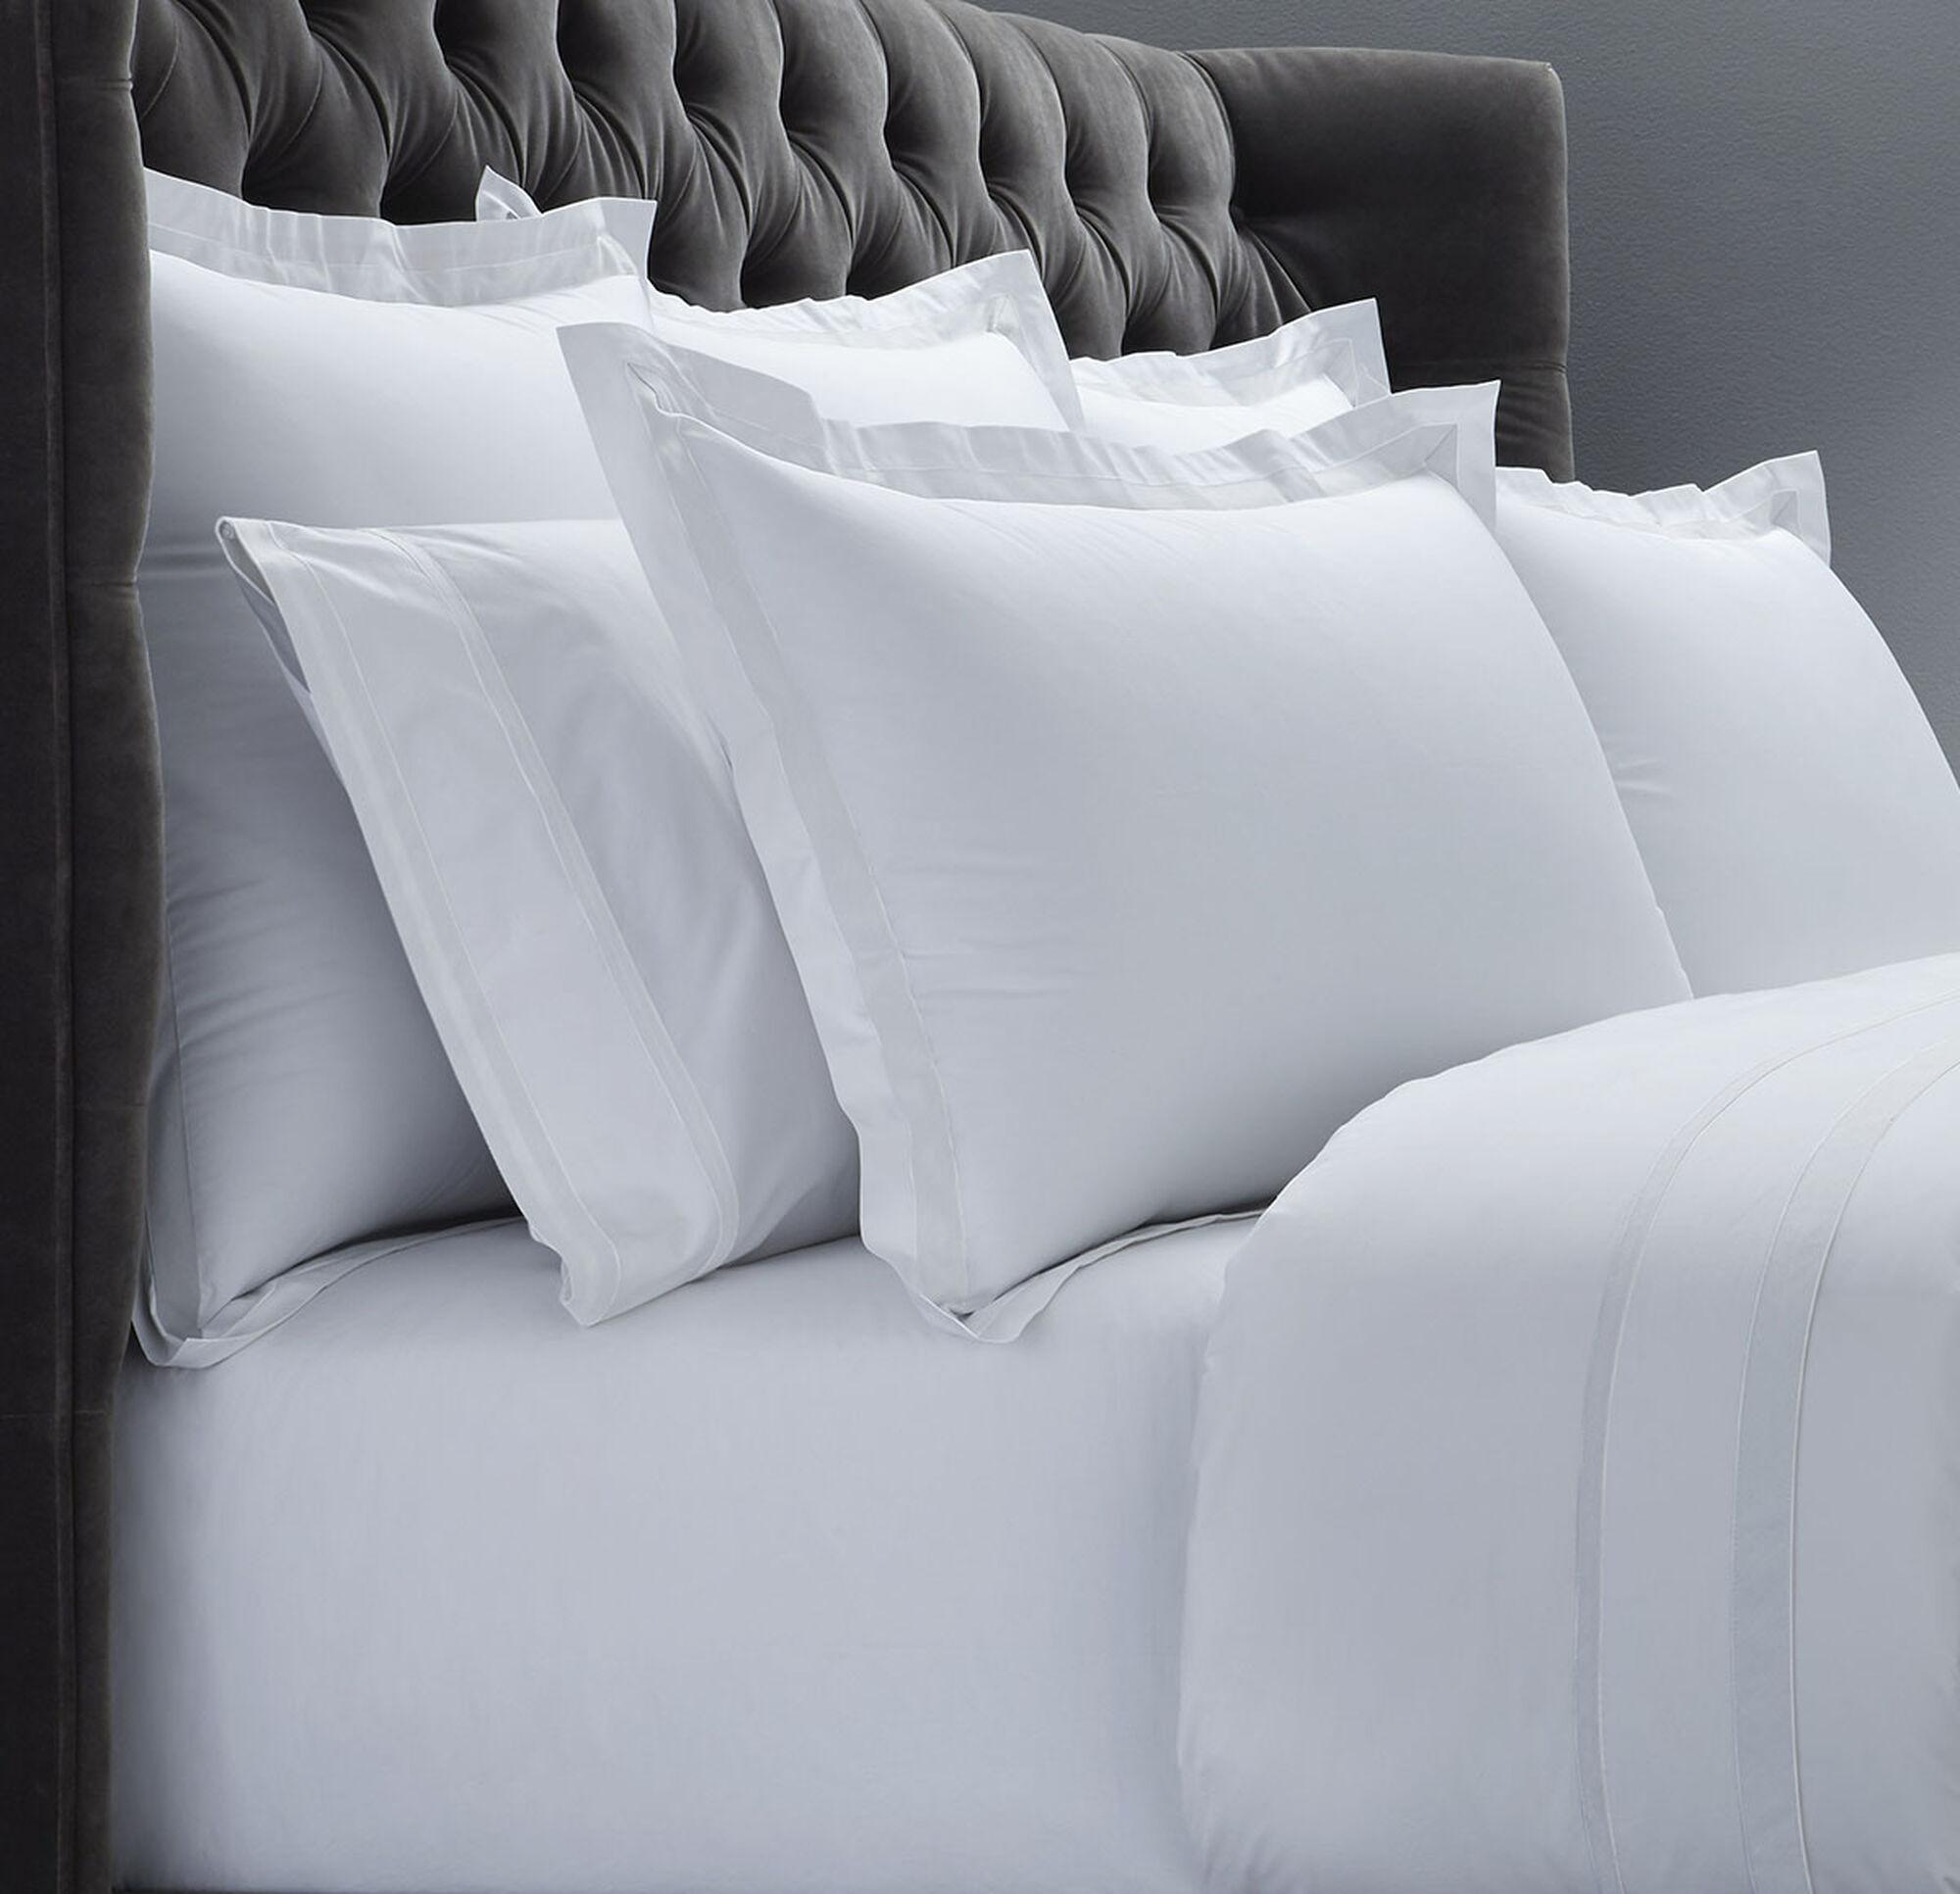 Felicity Pillow Cases